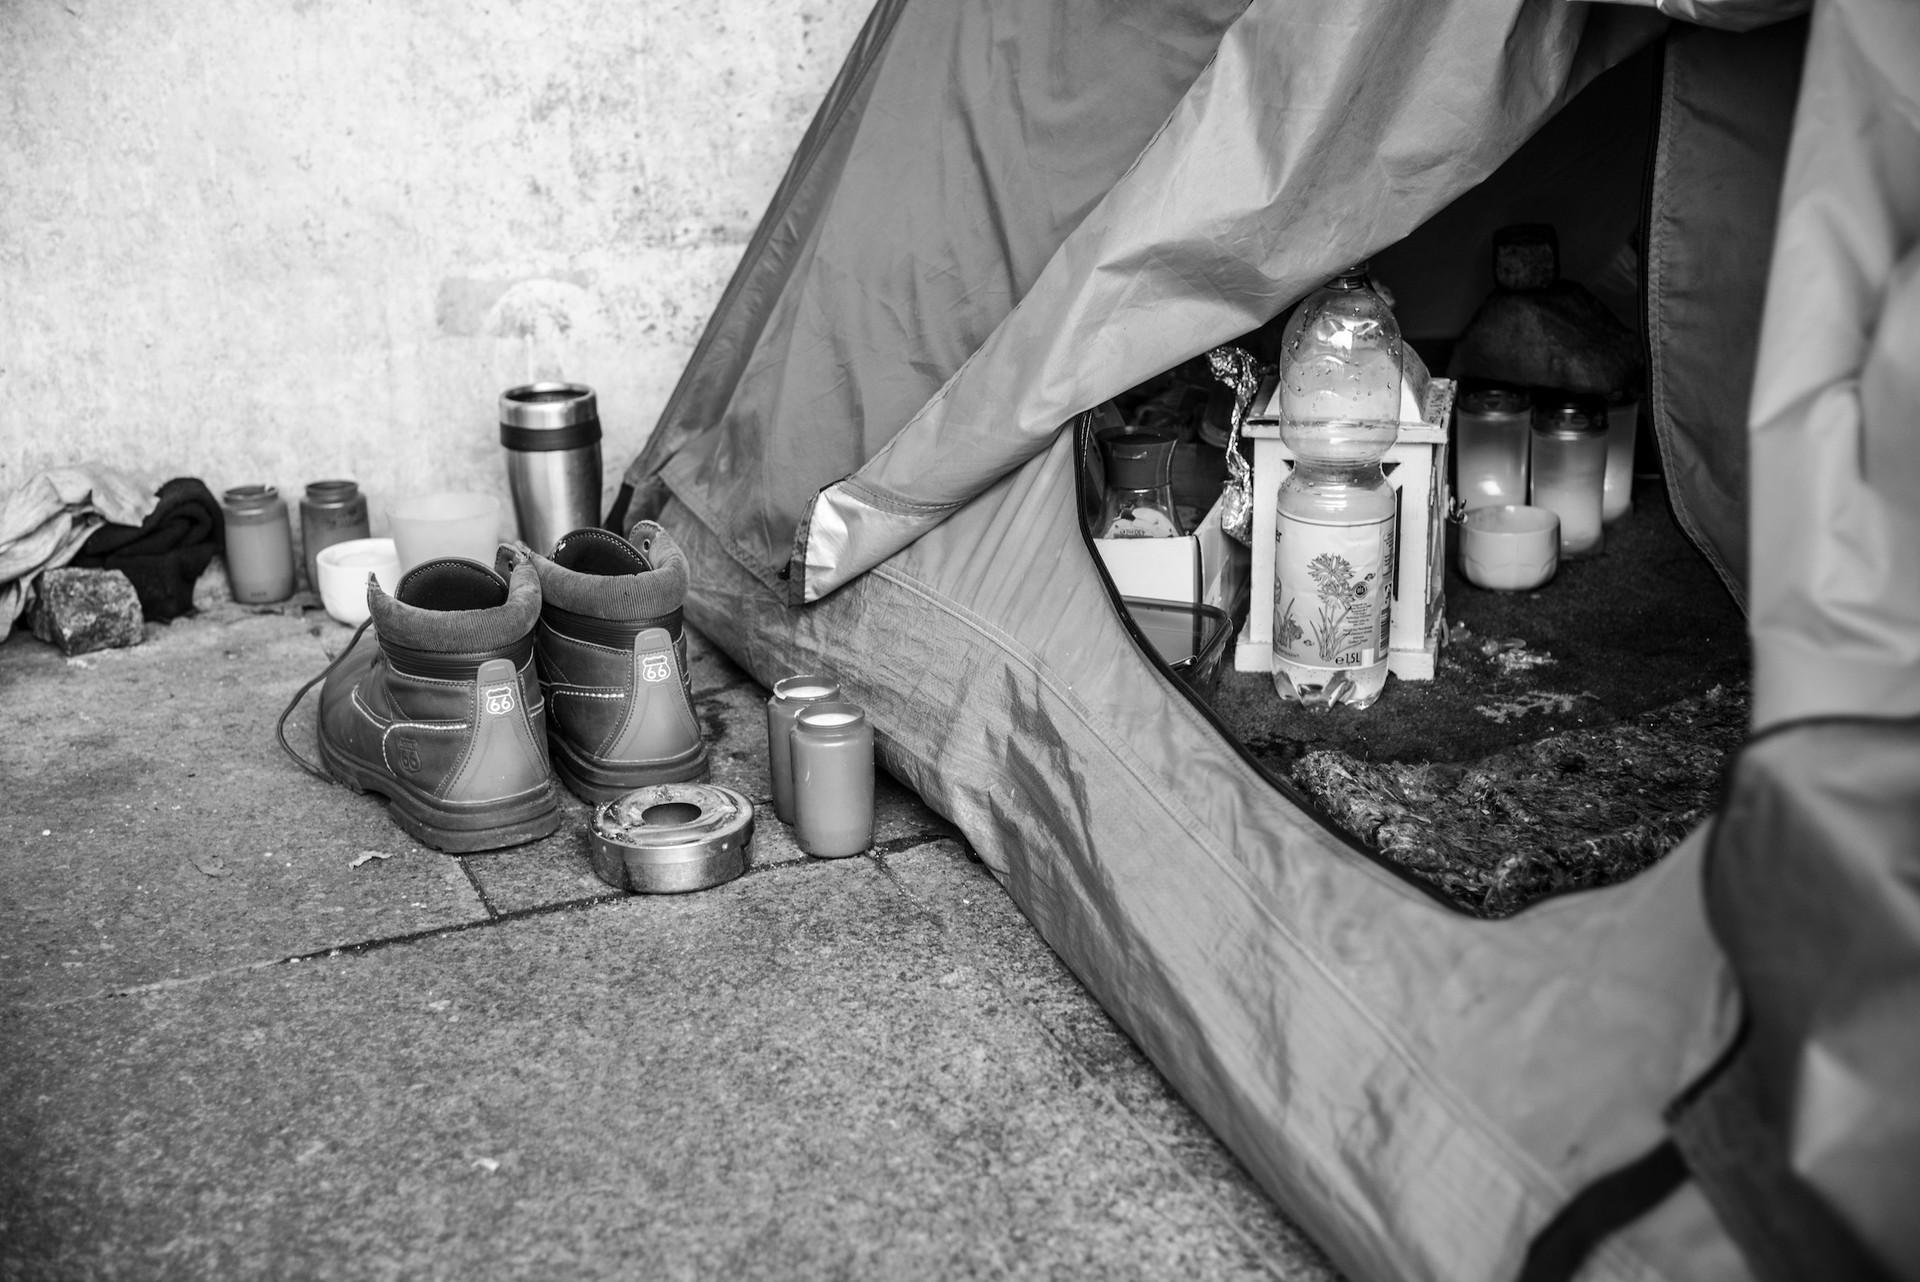 Homeless in times of Corona -2.jpeg